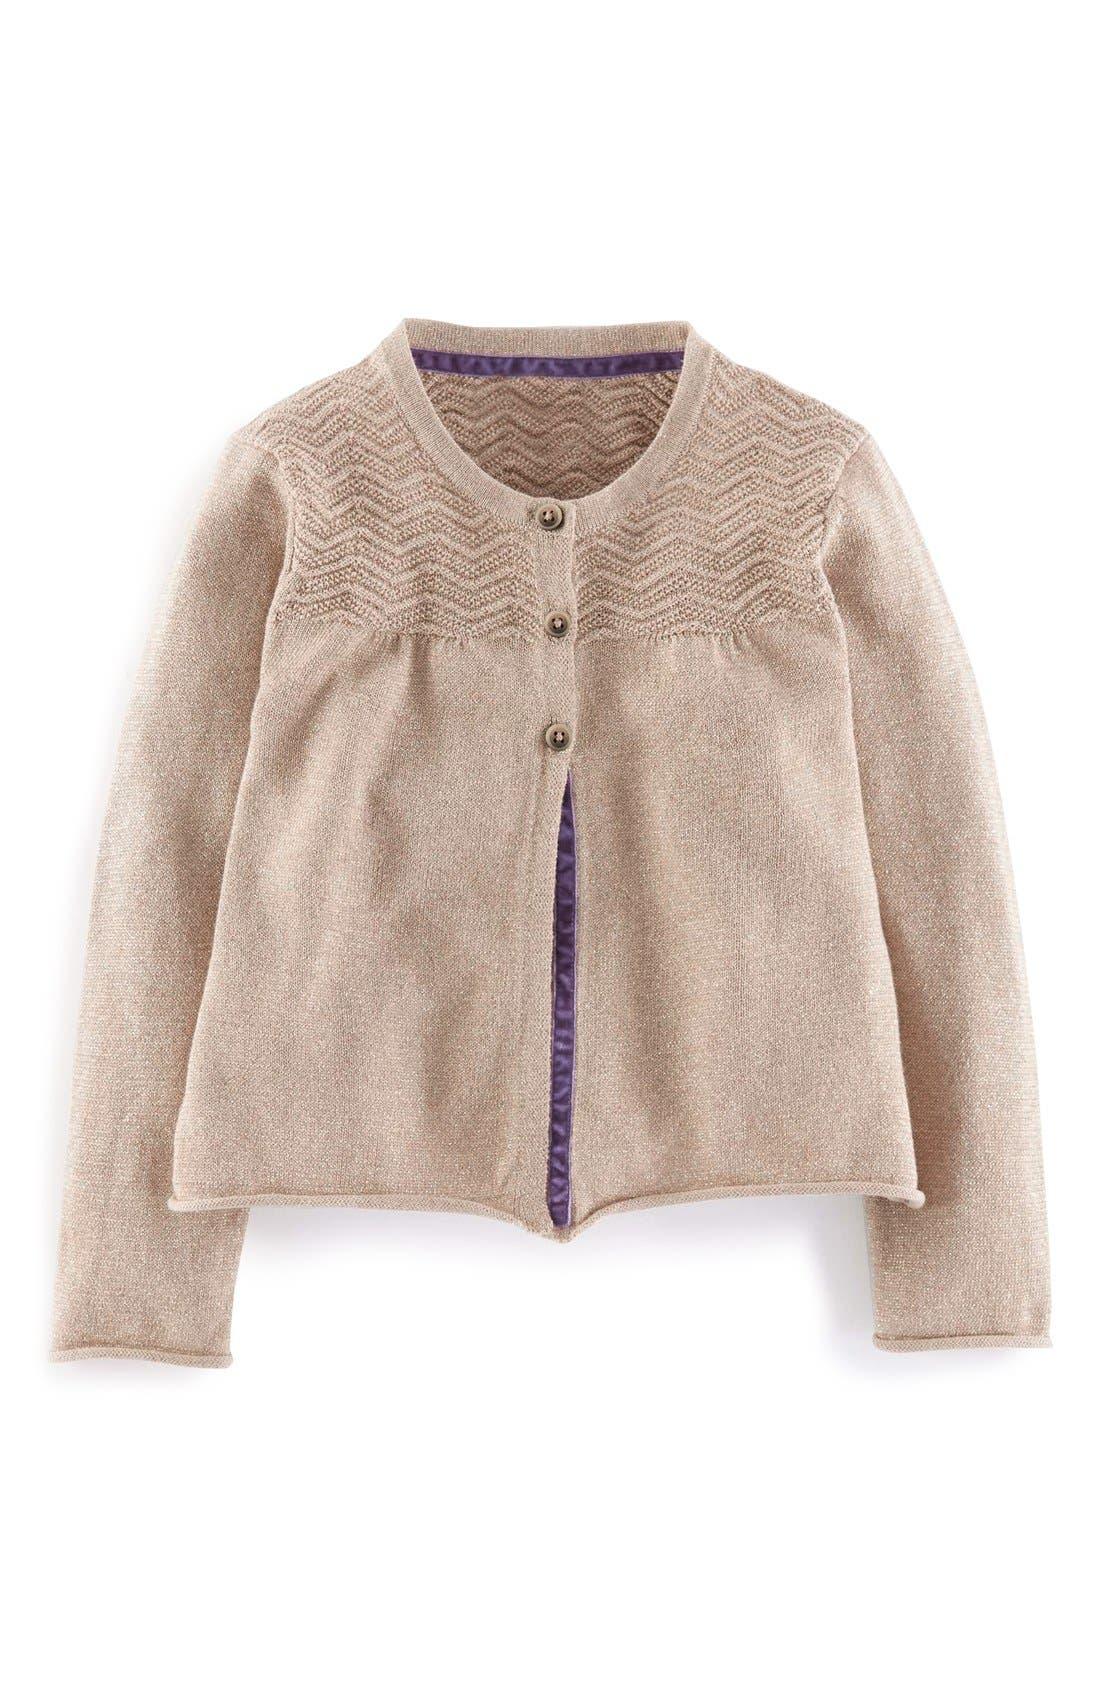 Main Image - Mini Boden Cotton & Cashmere Cardigan (Toddler, Little Girls & Big Girls)